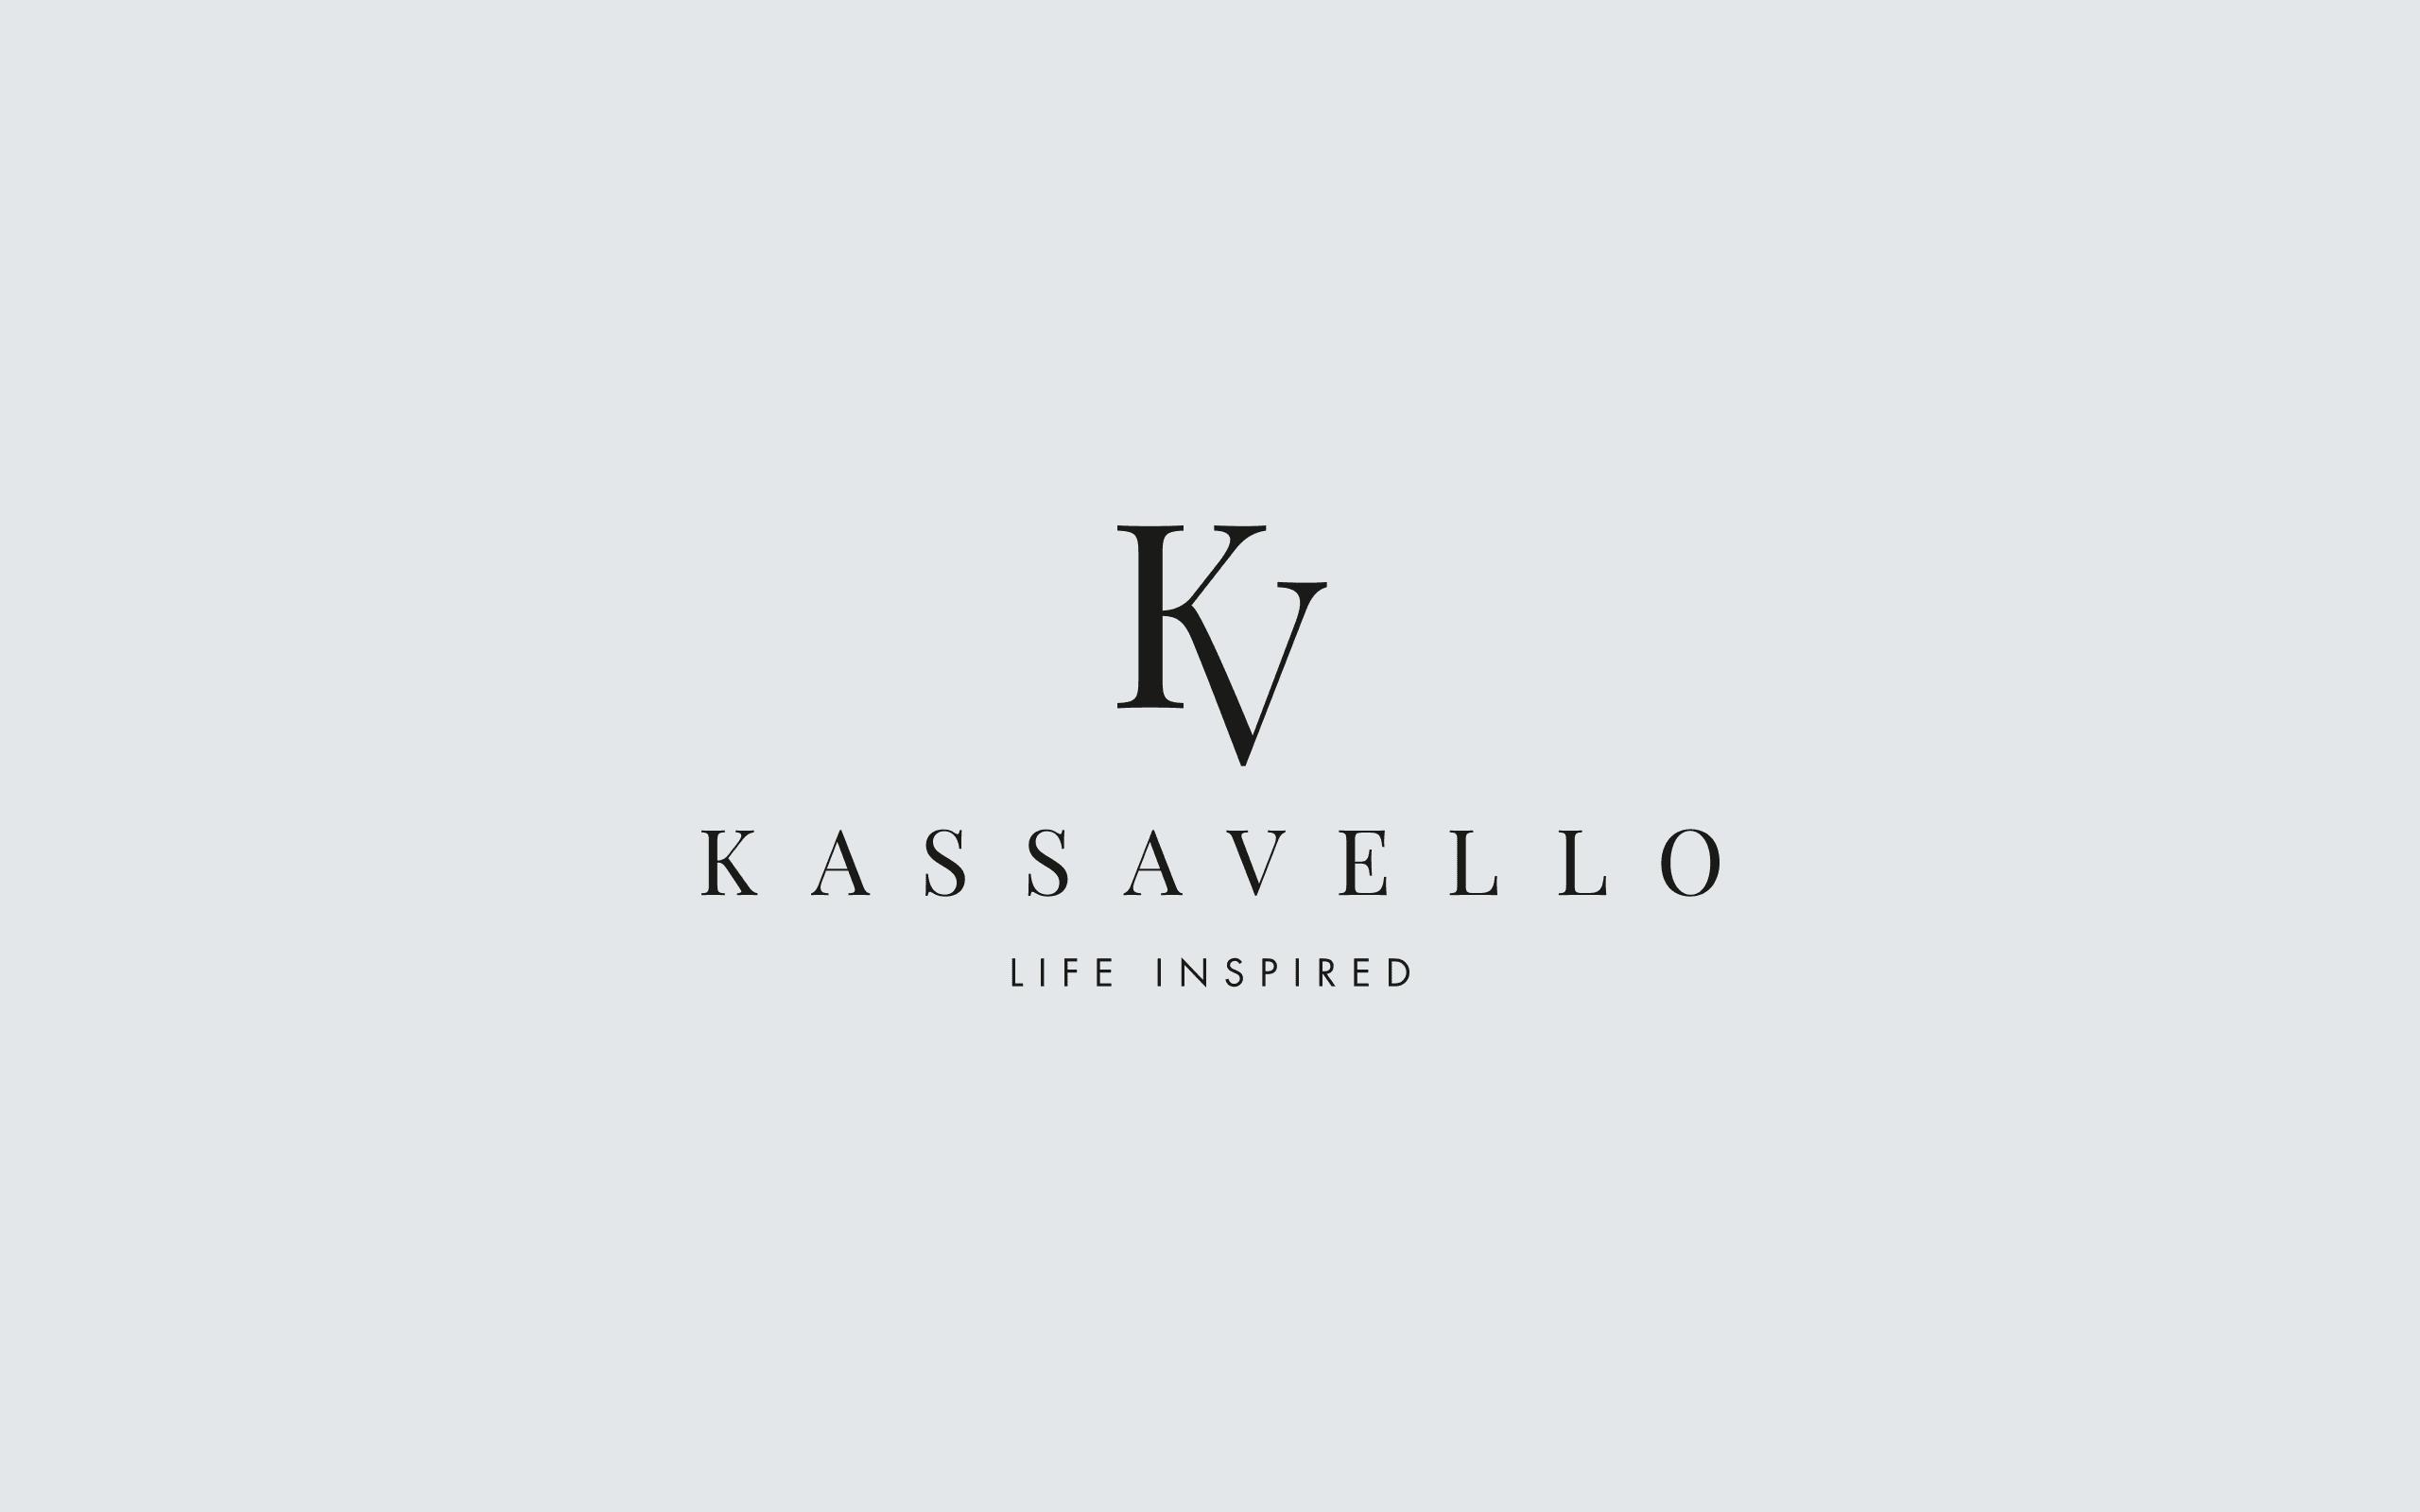 Kassavello logotype and new tagline | Zeke Creative